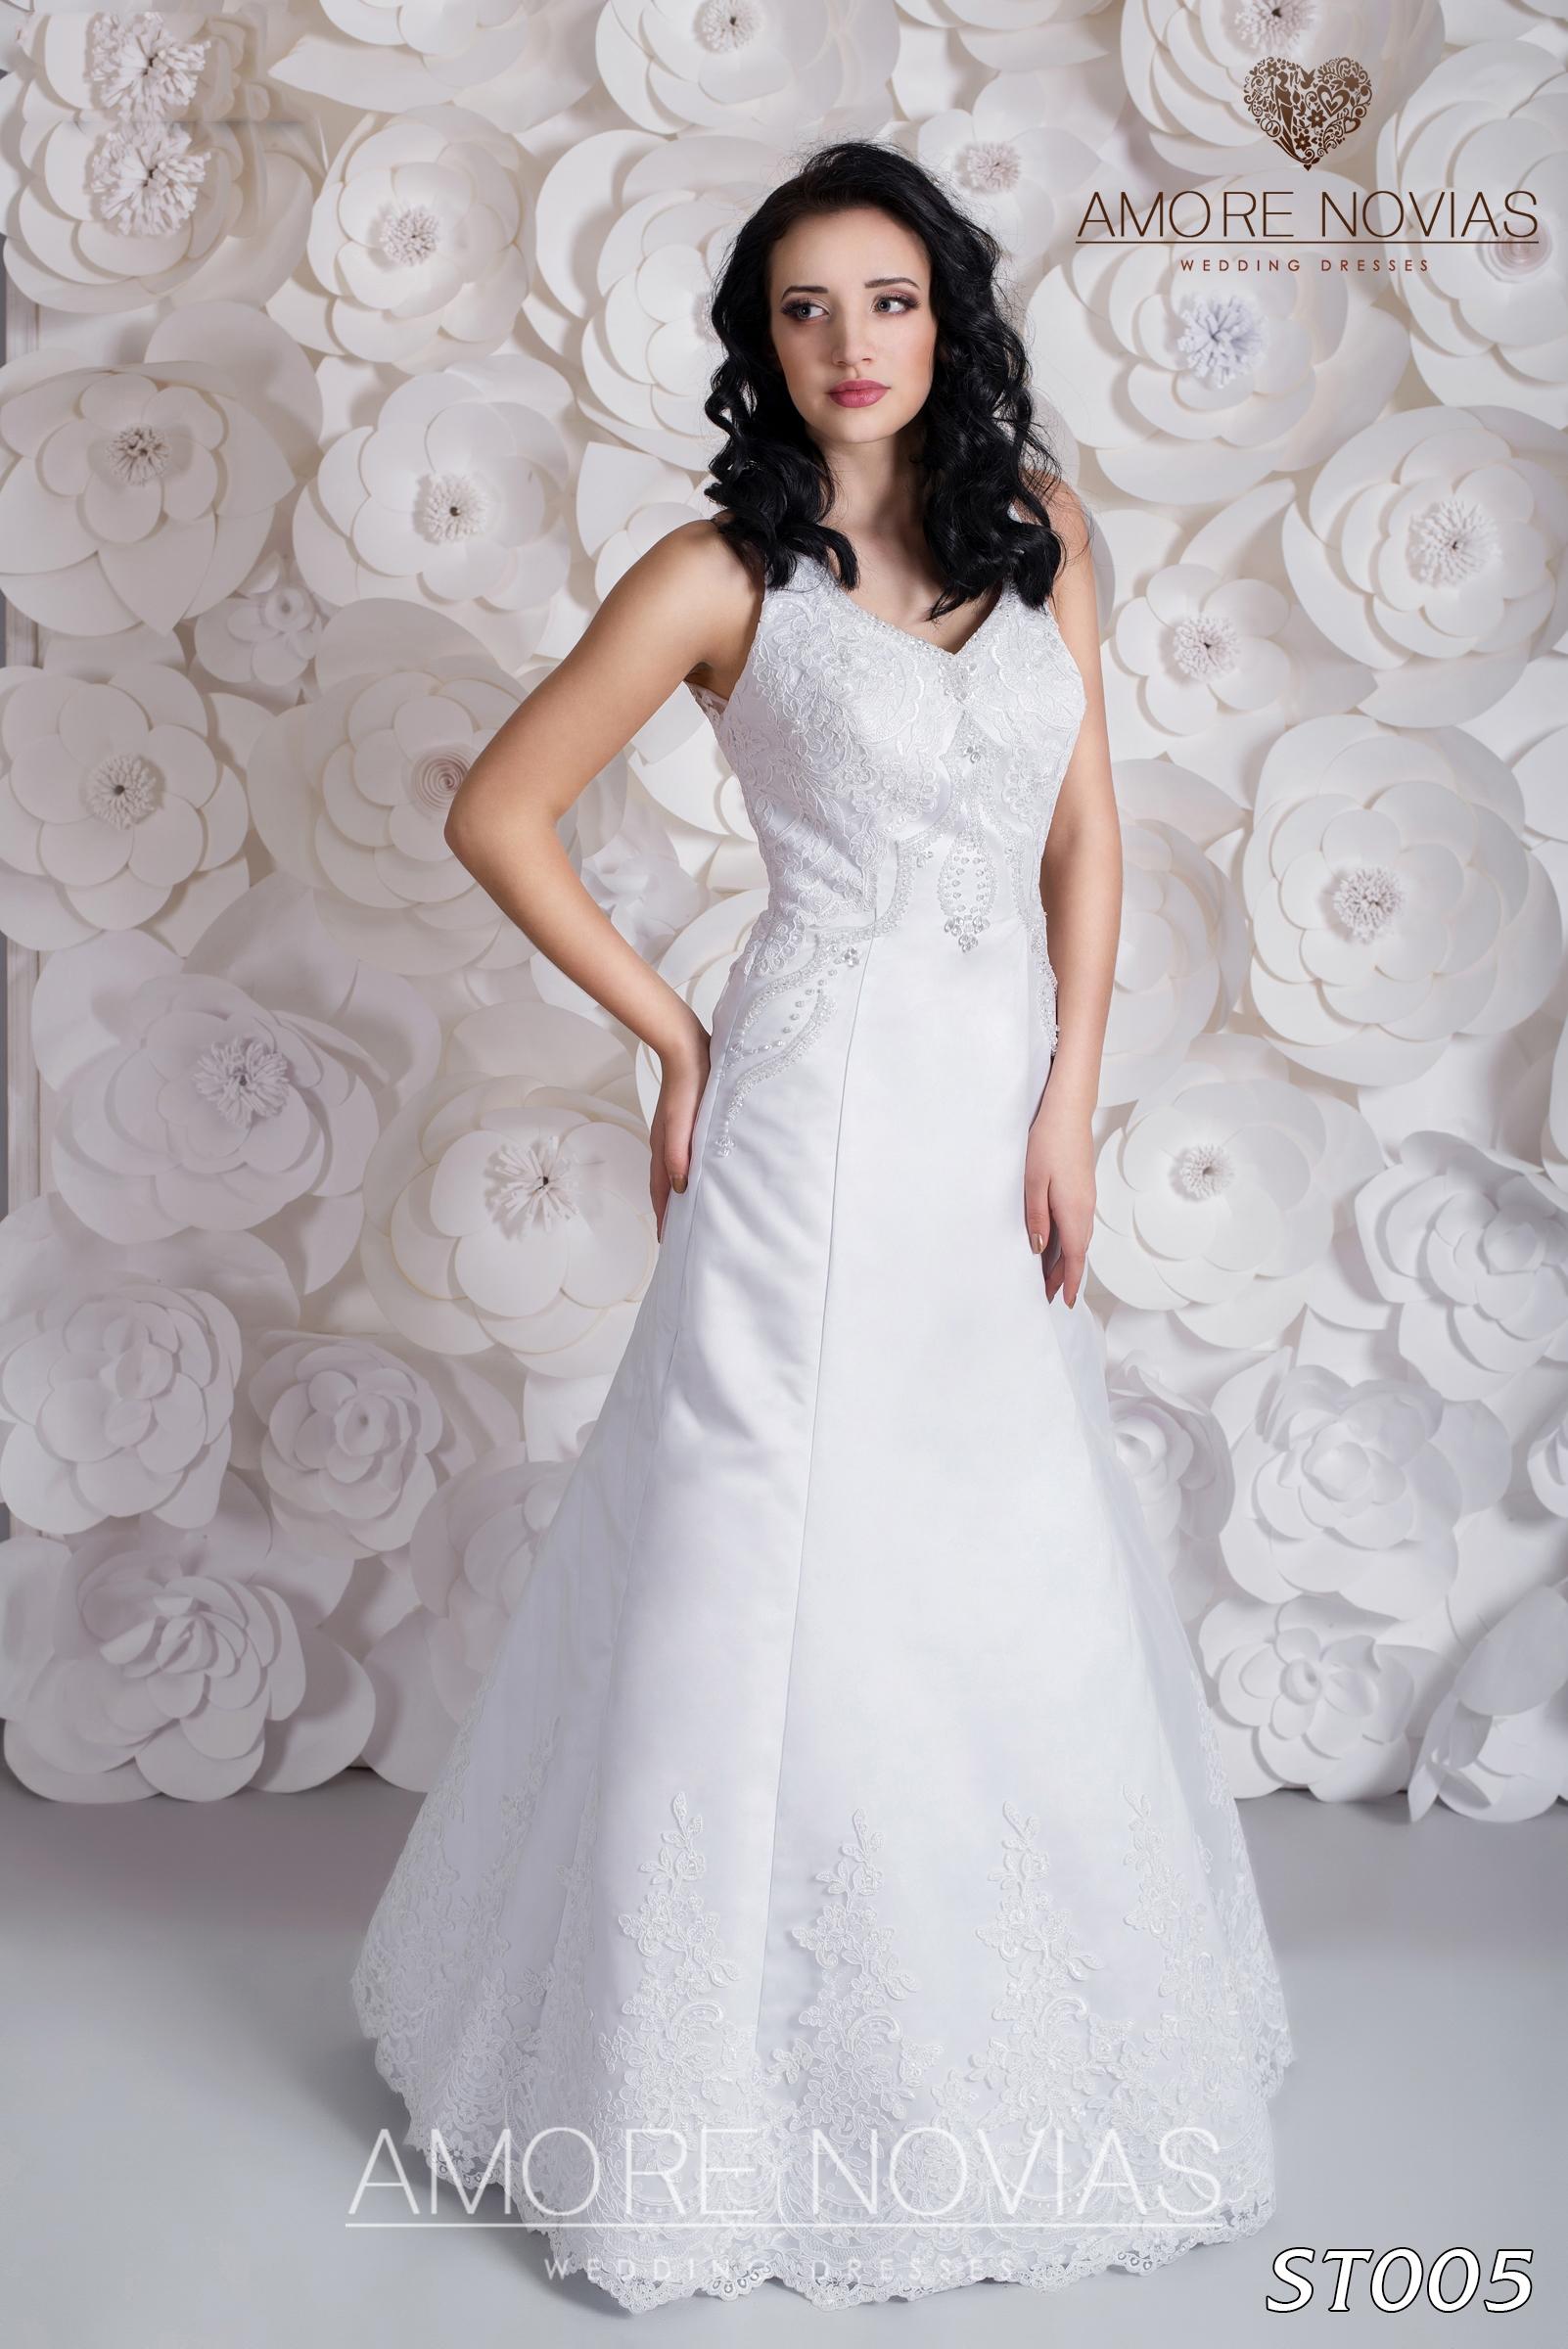 http://amore-novias.com/images/stories/virtuemart/product/st005.jpg